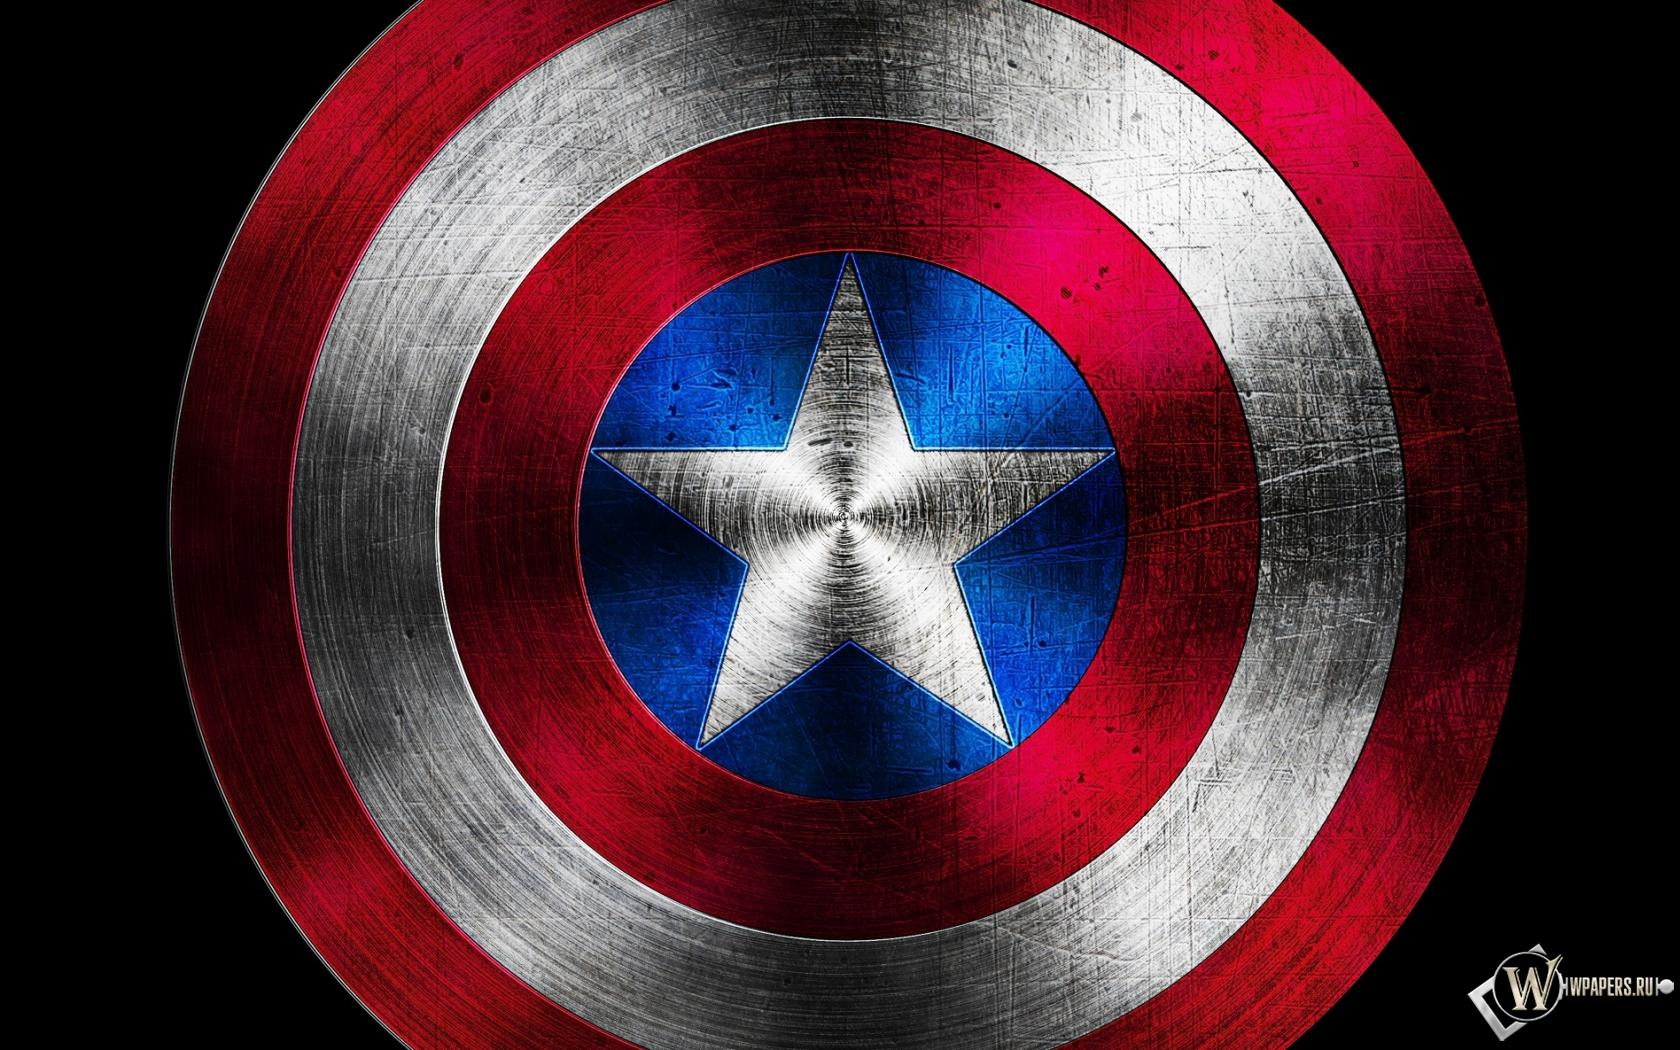 8589130559040 captain america shield wallpaper hdjpg 1680x1050